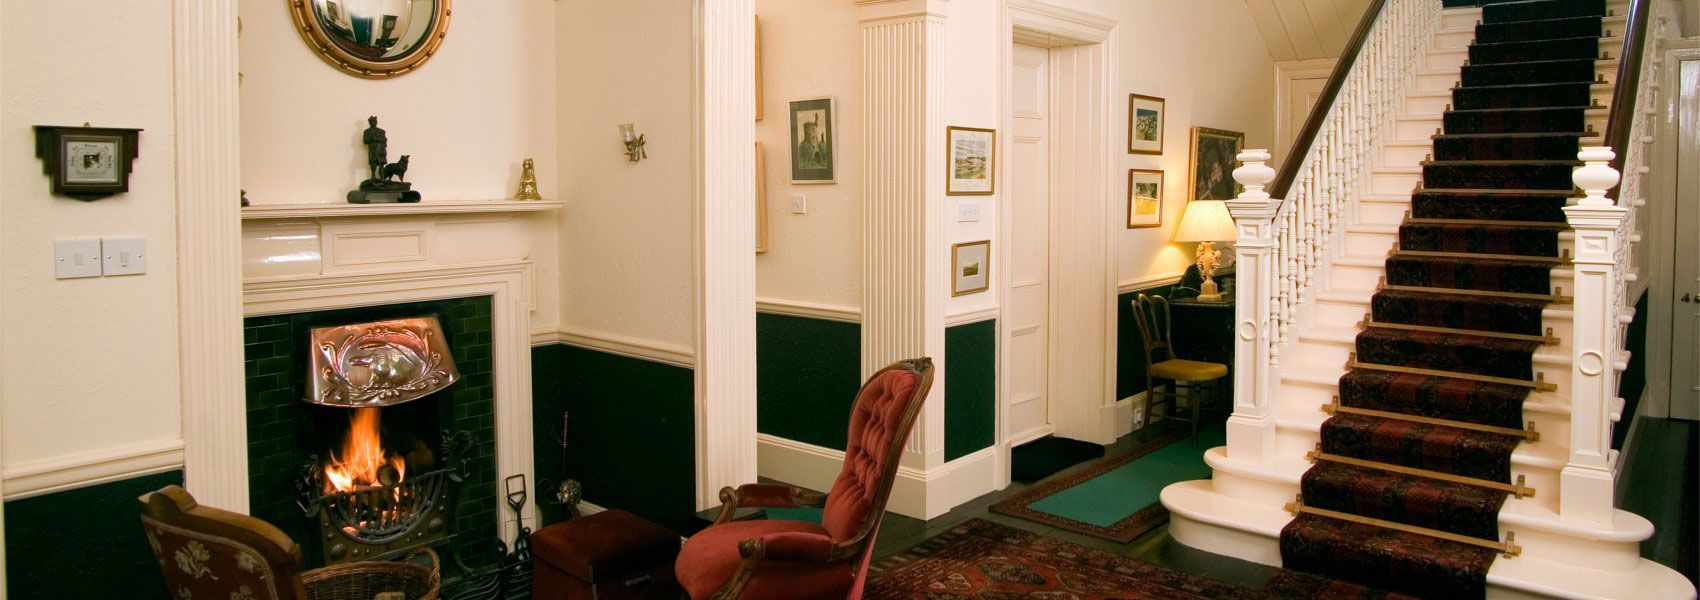 napier-hallway-2-homeage